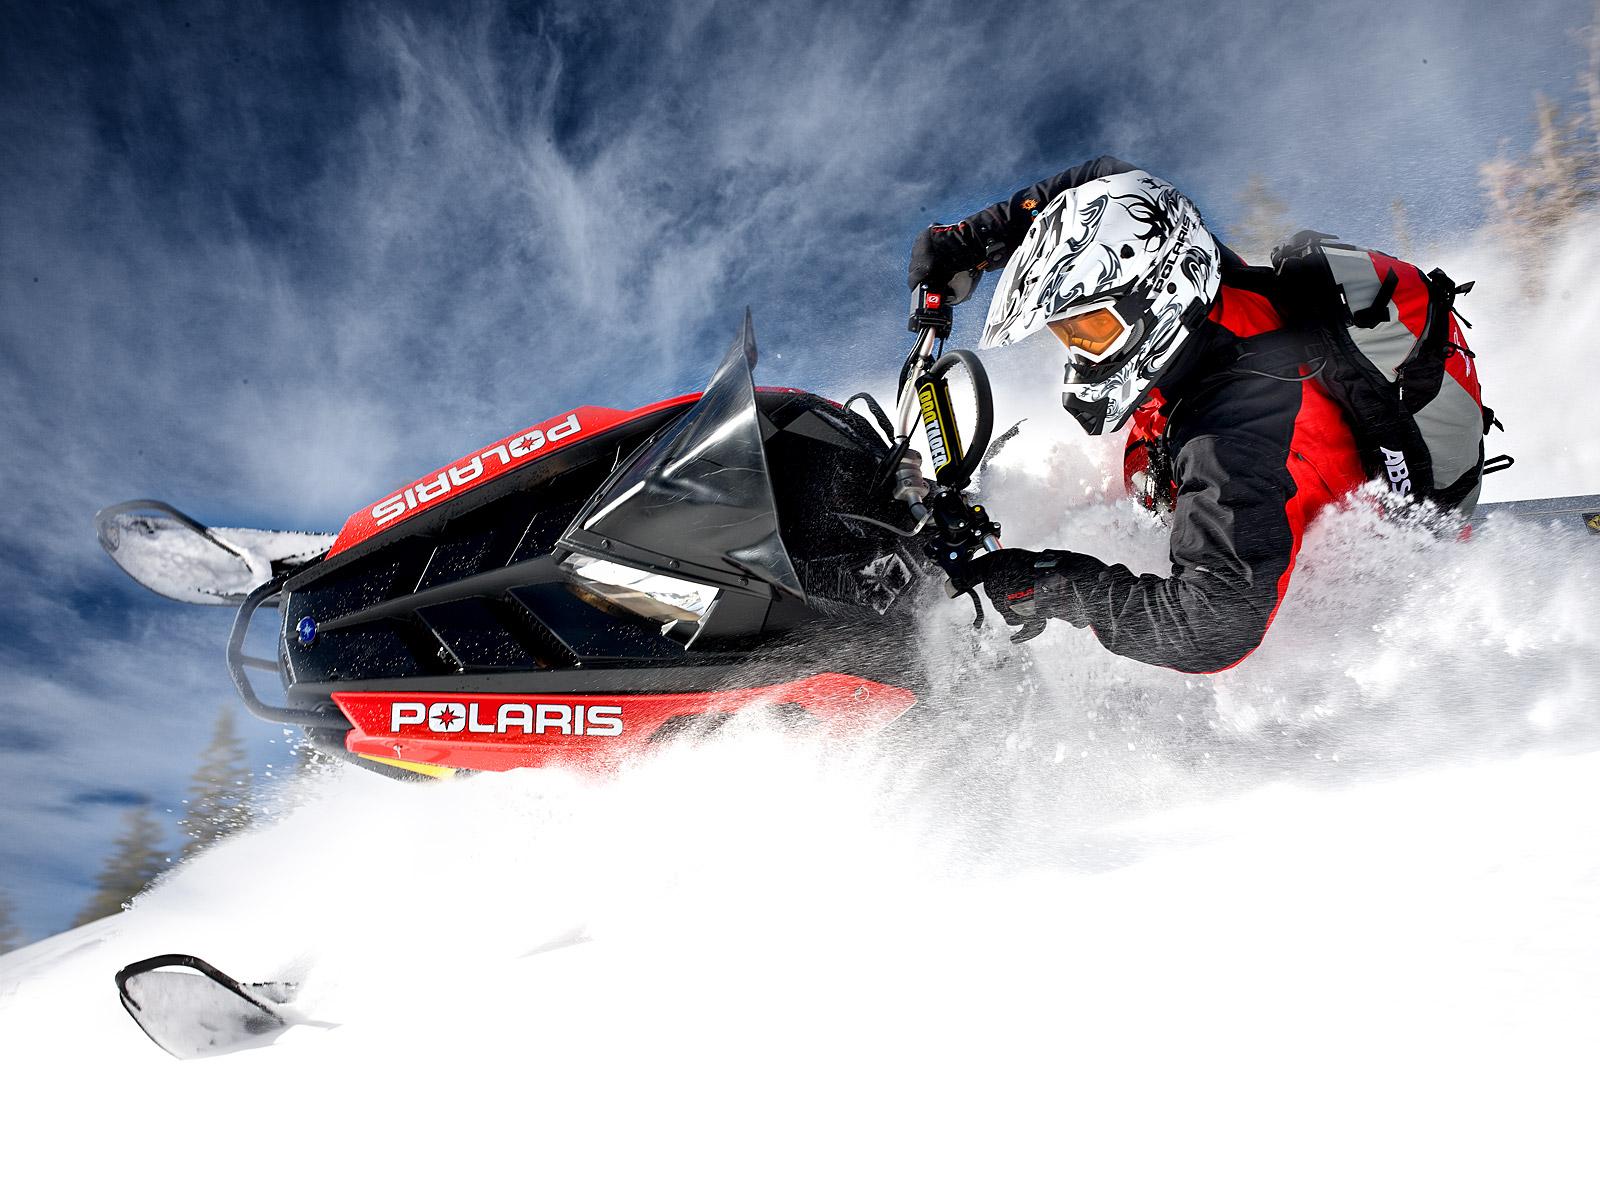 POLARIS PRO RMK snowmobile winter sled snow t wallpaper 1600x1200 1600x1200